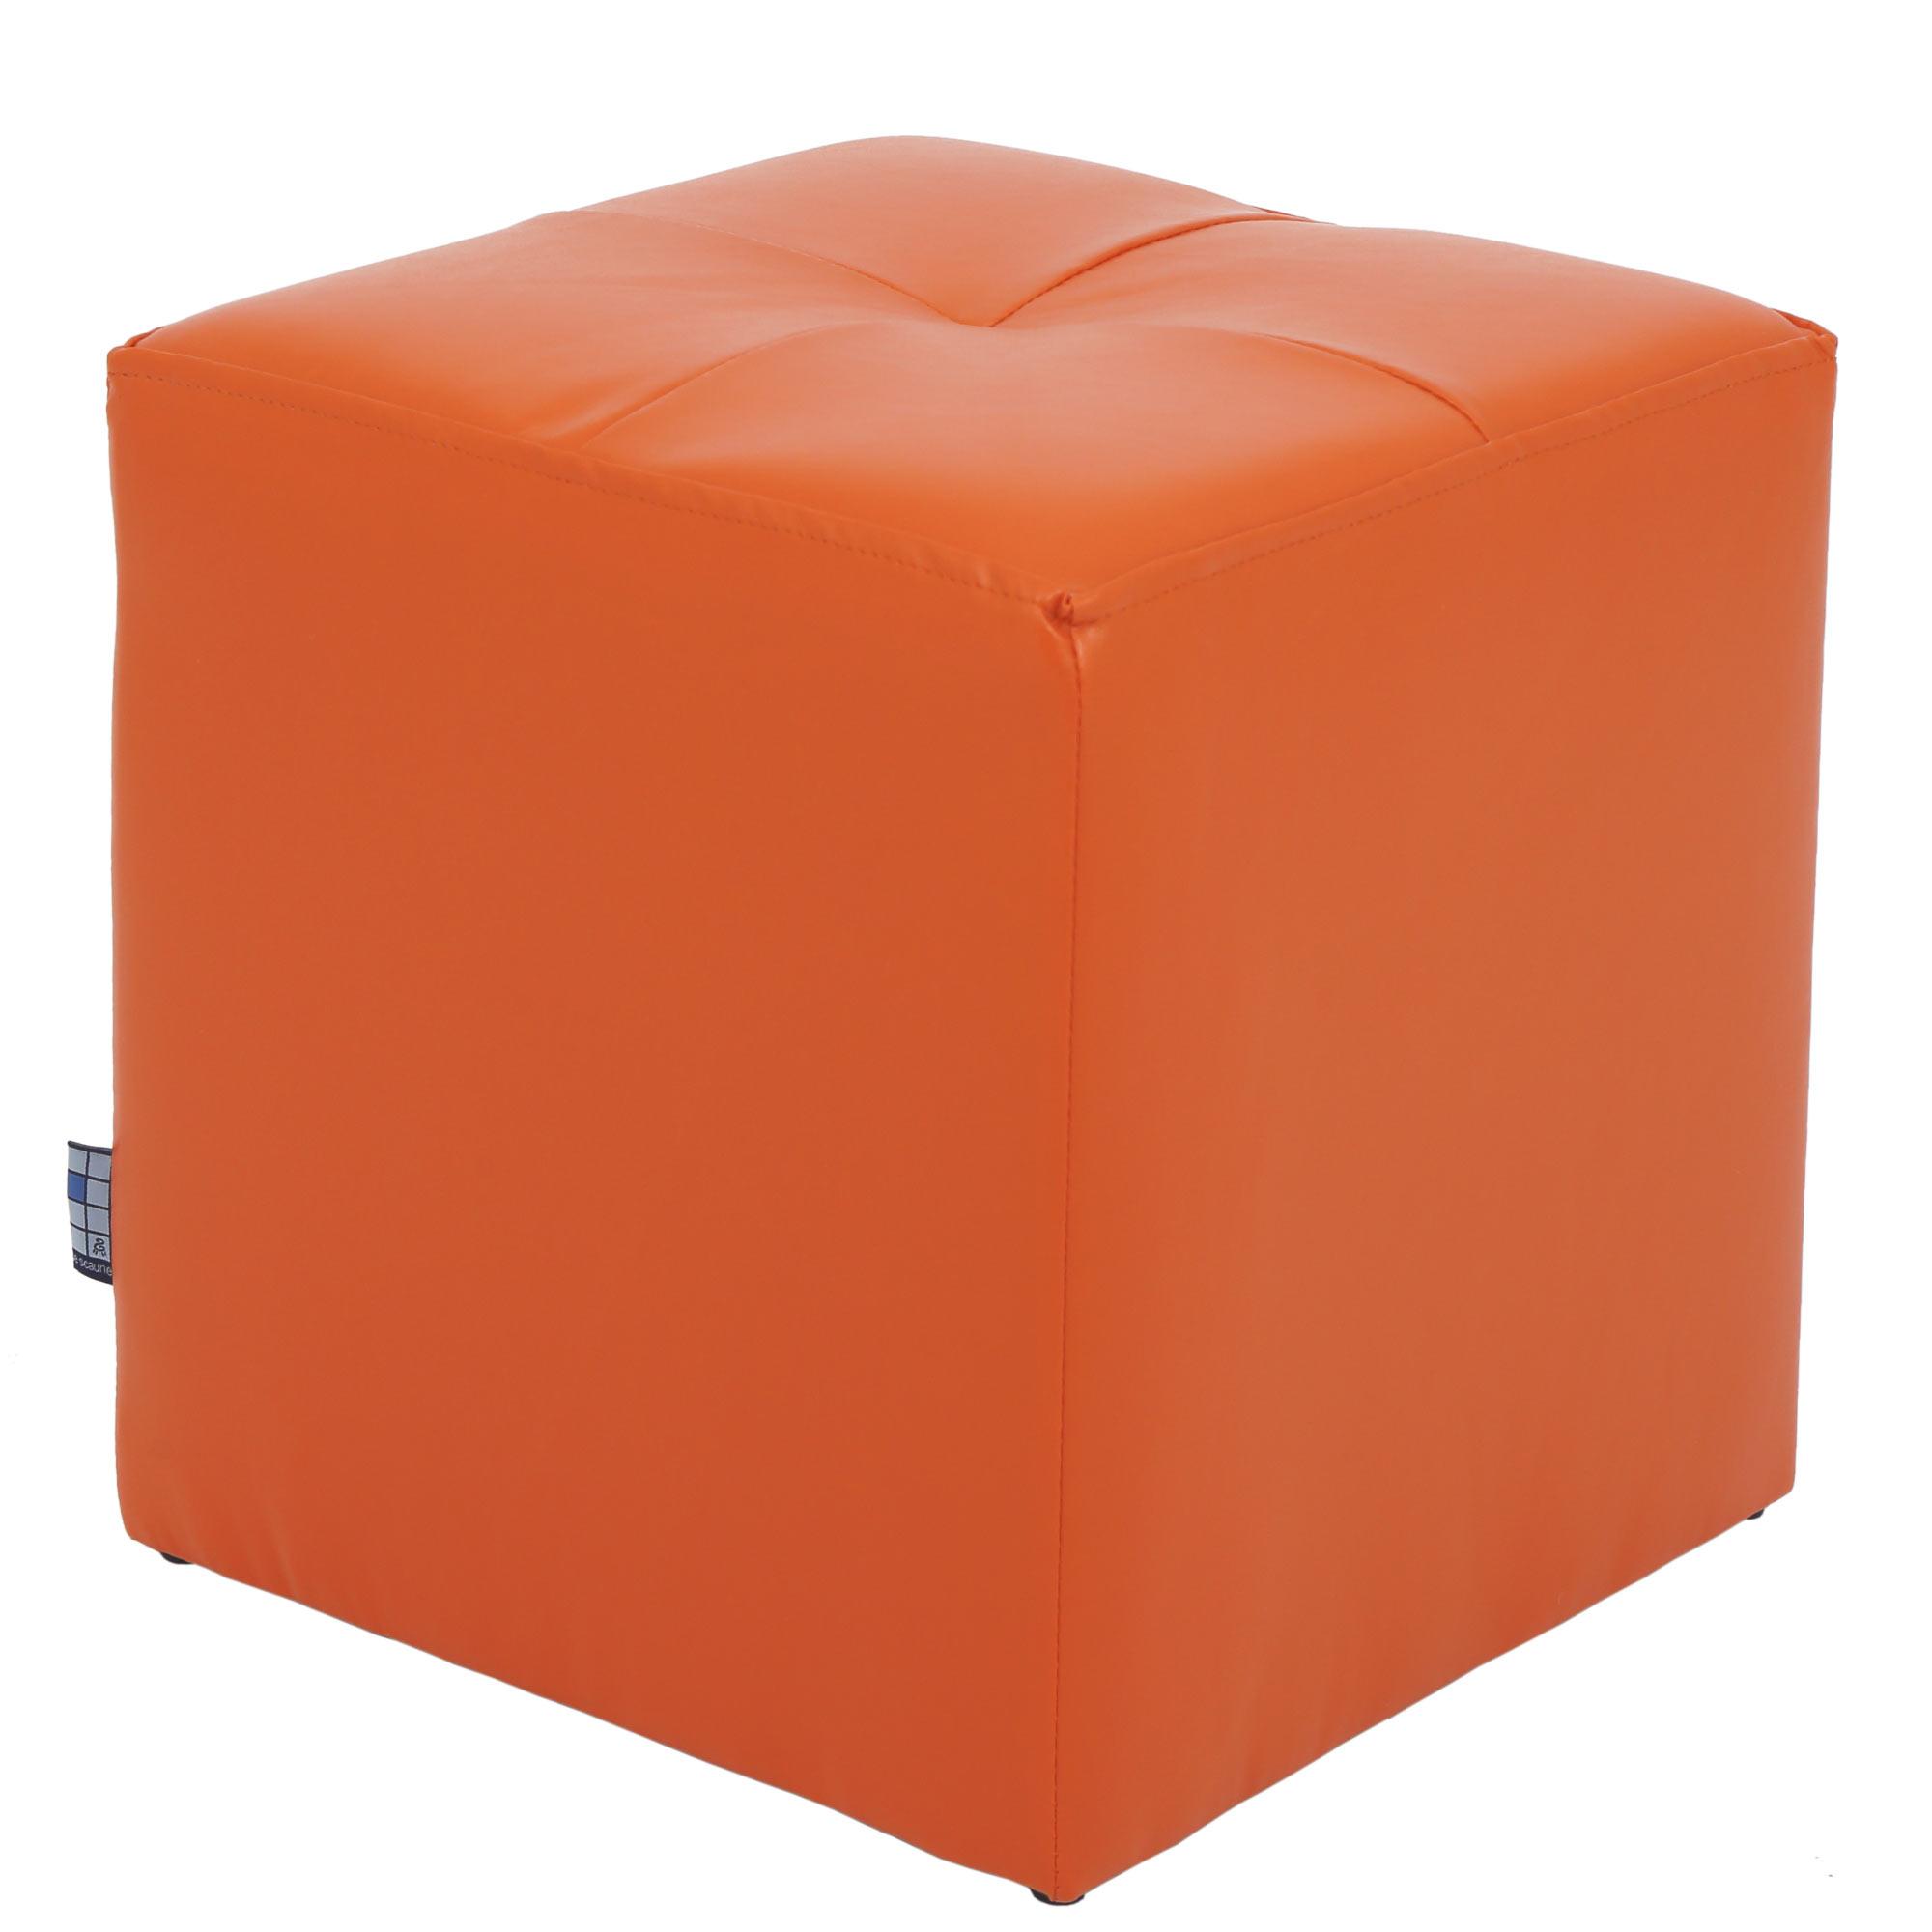 Taburet Cool tapiterie imitatie de piele, orange IP21895, 38 cm inaltime